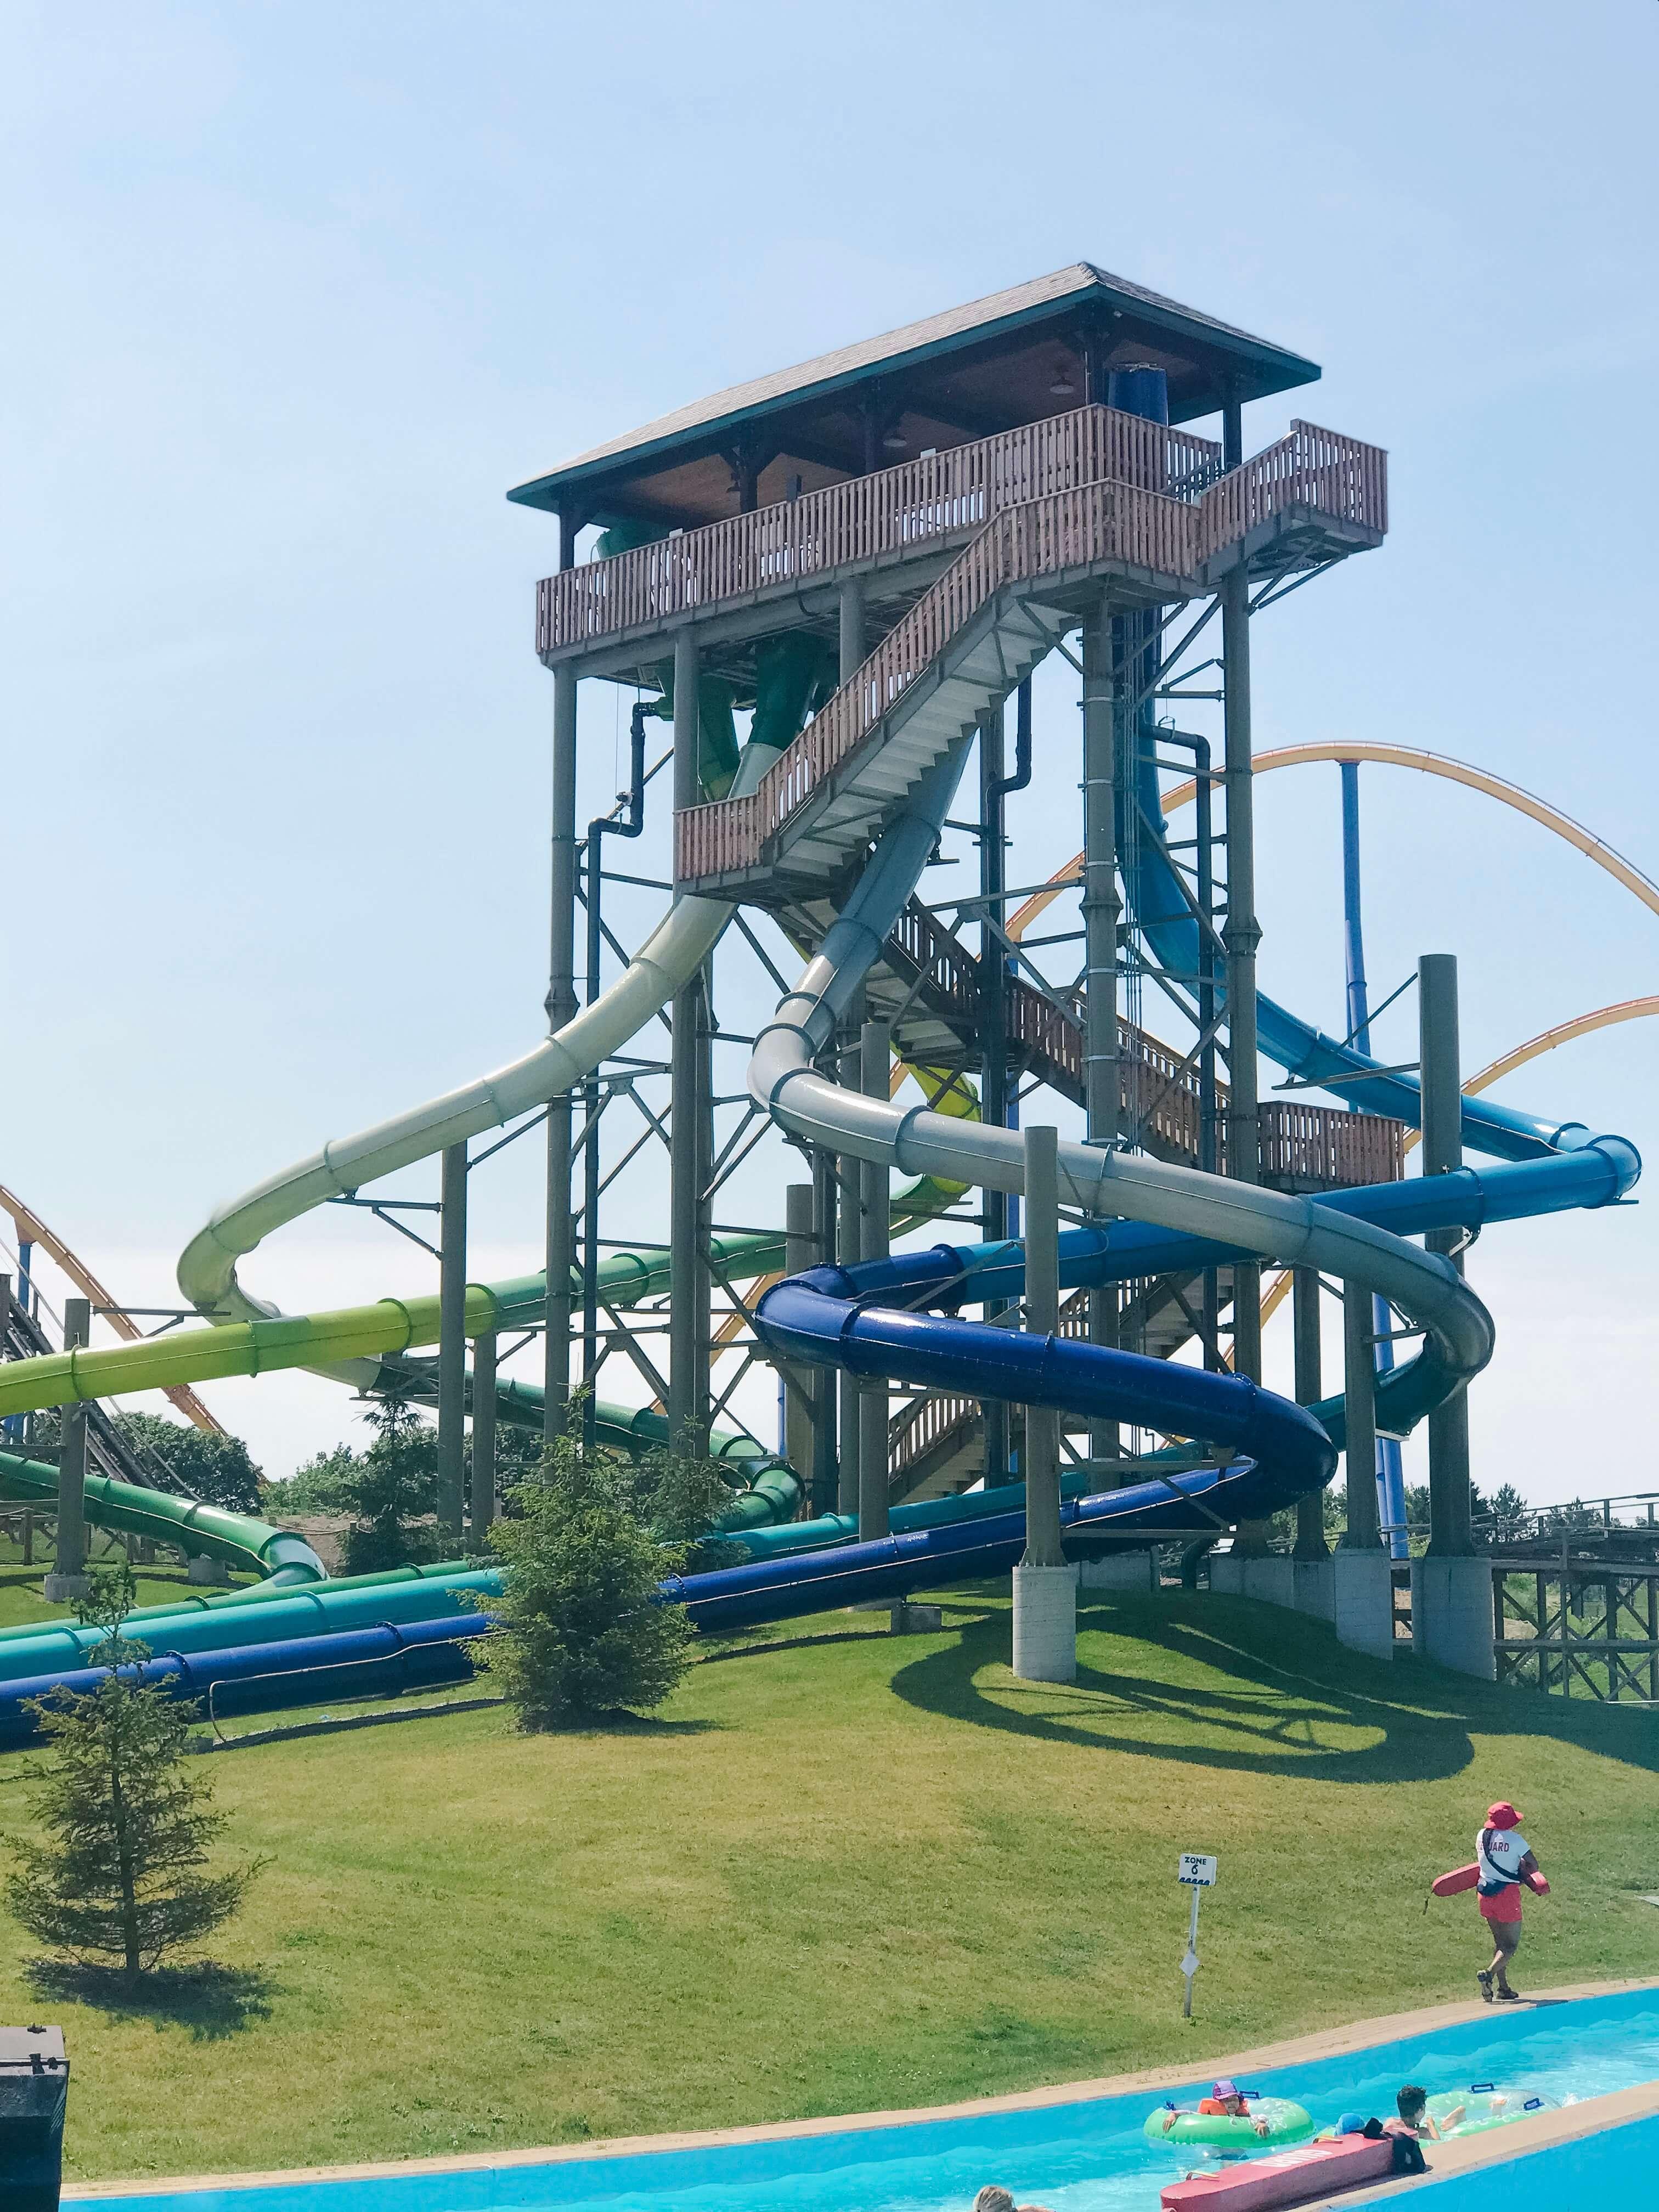 What to do at Canada's Wonderland's splash works; #wondercrew